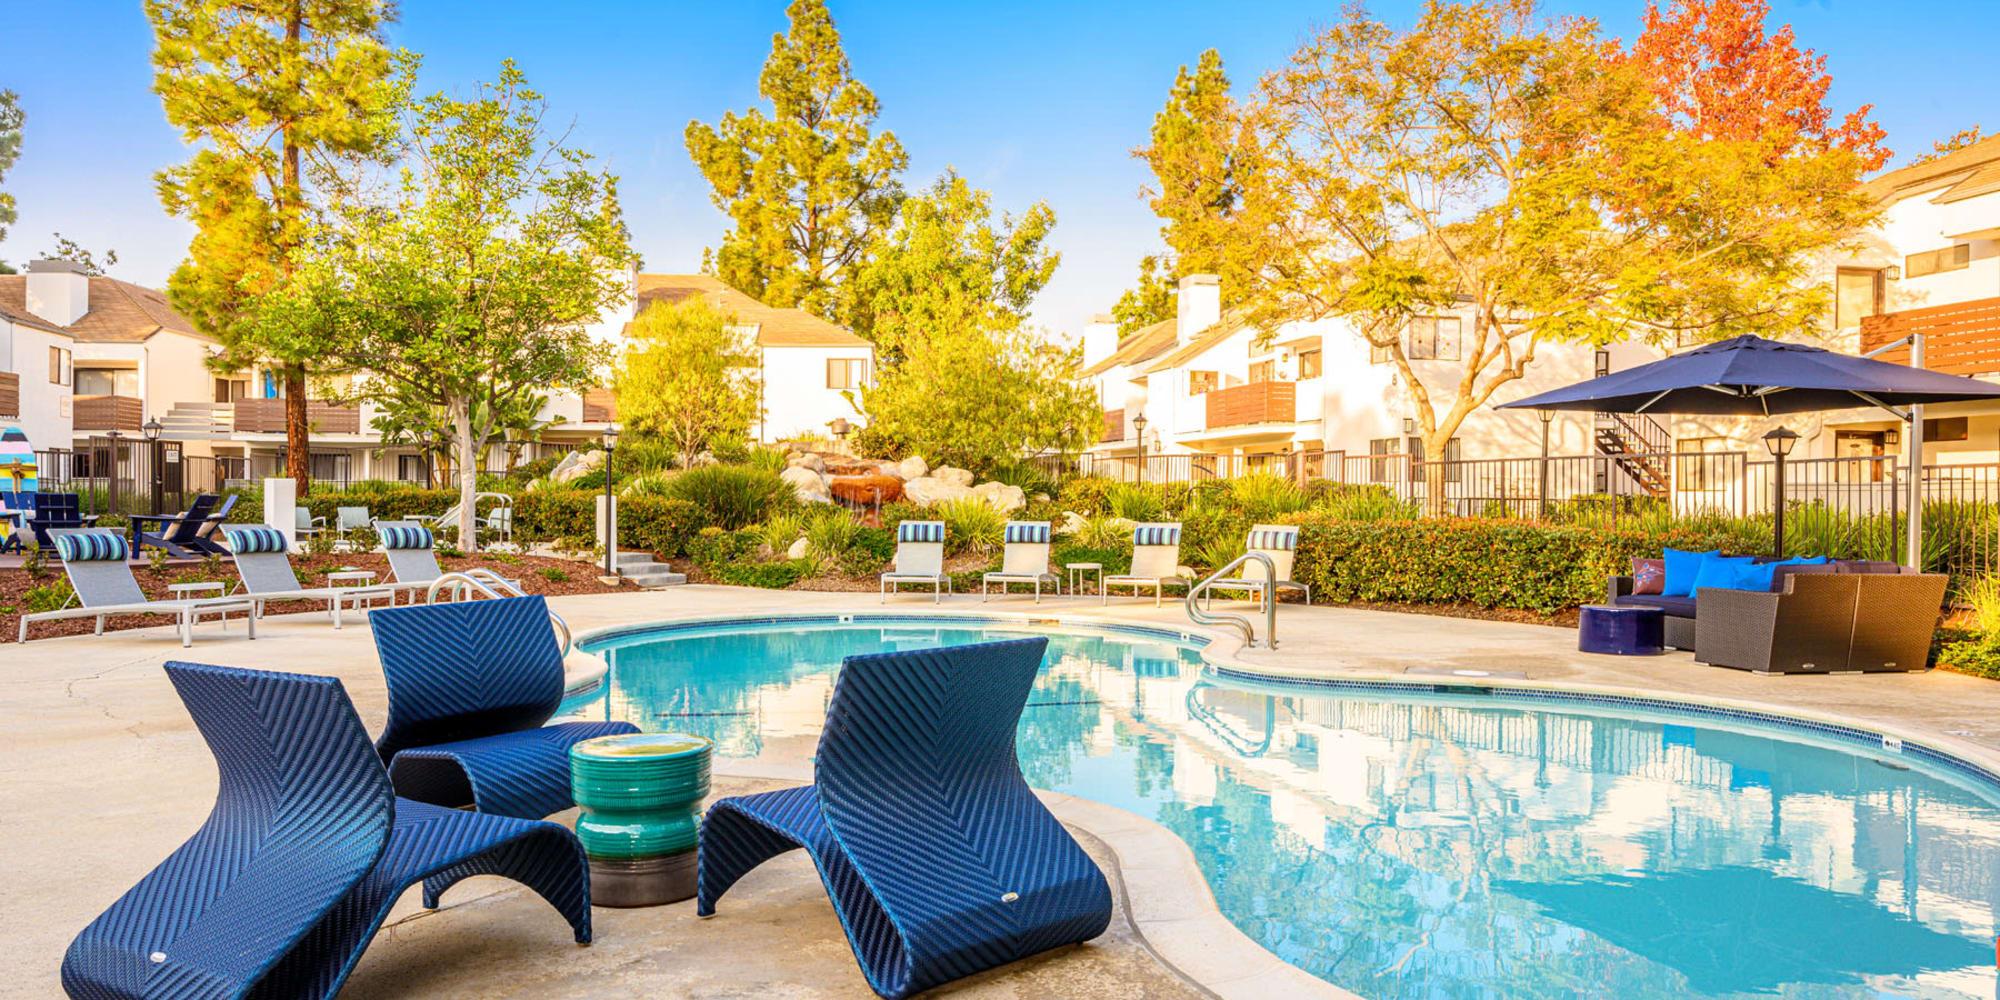 Avant garde chairs and a small table near the swimming pool at Sendero Huntington Beach in Huntington Beach, California